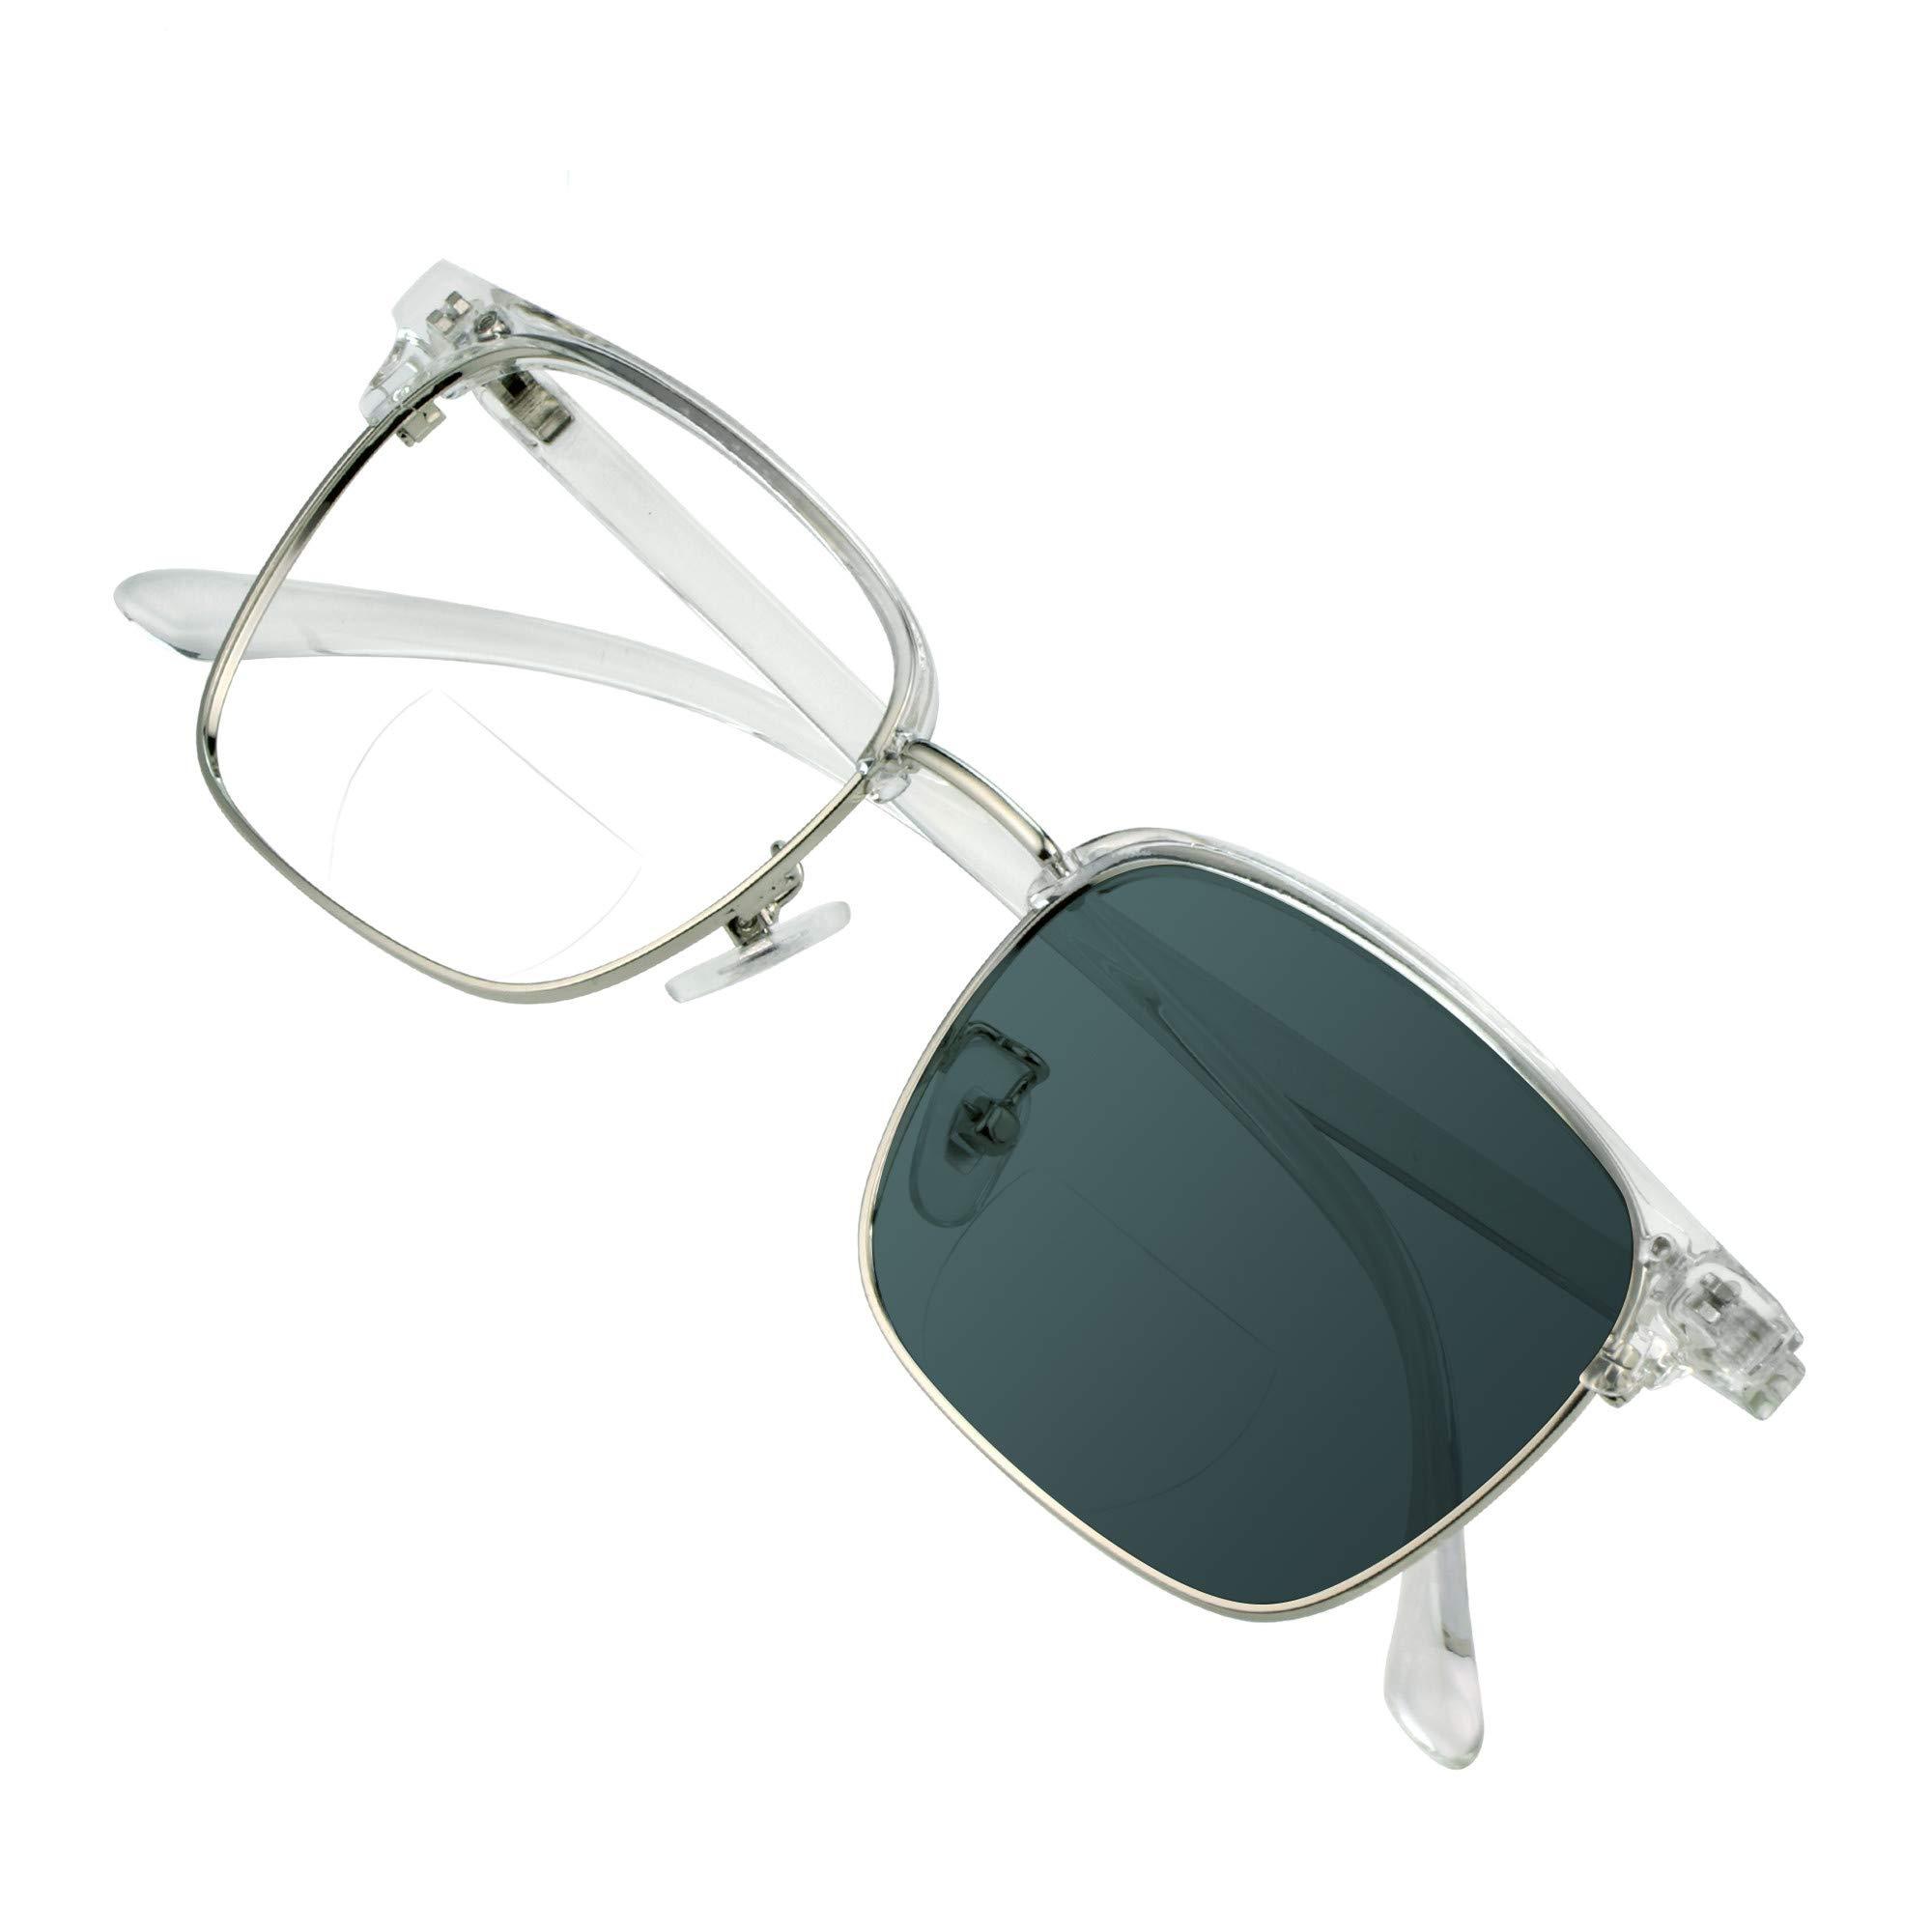 VisionGlobal Bifocal Reading Glasses Photochromic Dark Gray Sunglasses, Classic Retro Square Eyewear 100% UV Protection Reduce Fatigue (Up+0.00/Down+1.00)